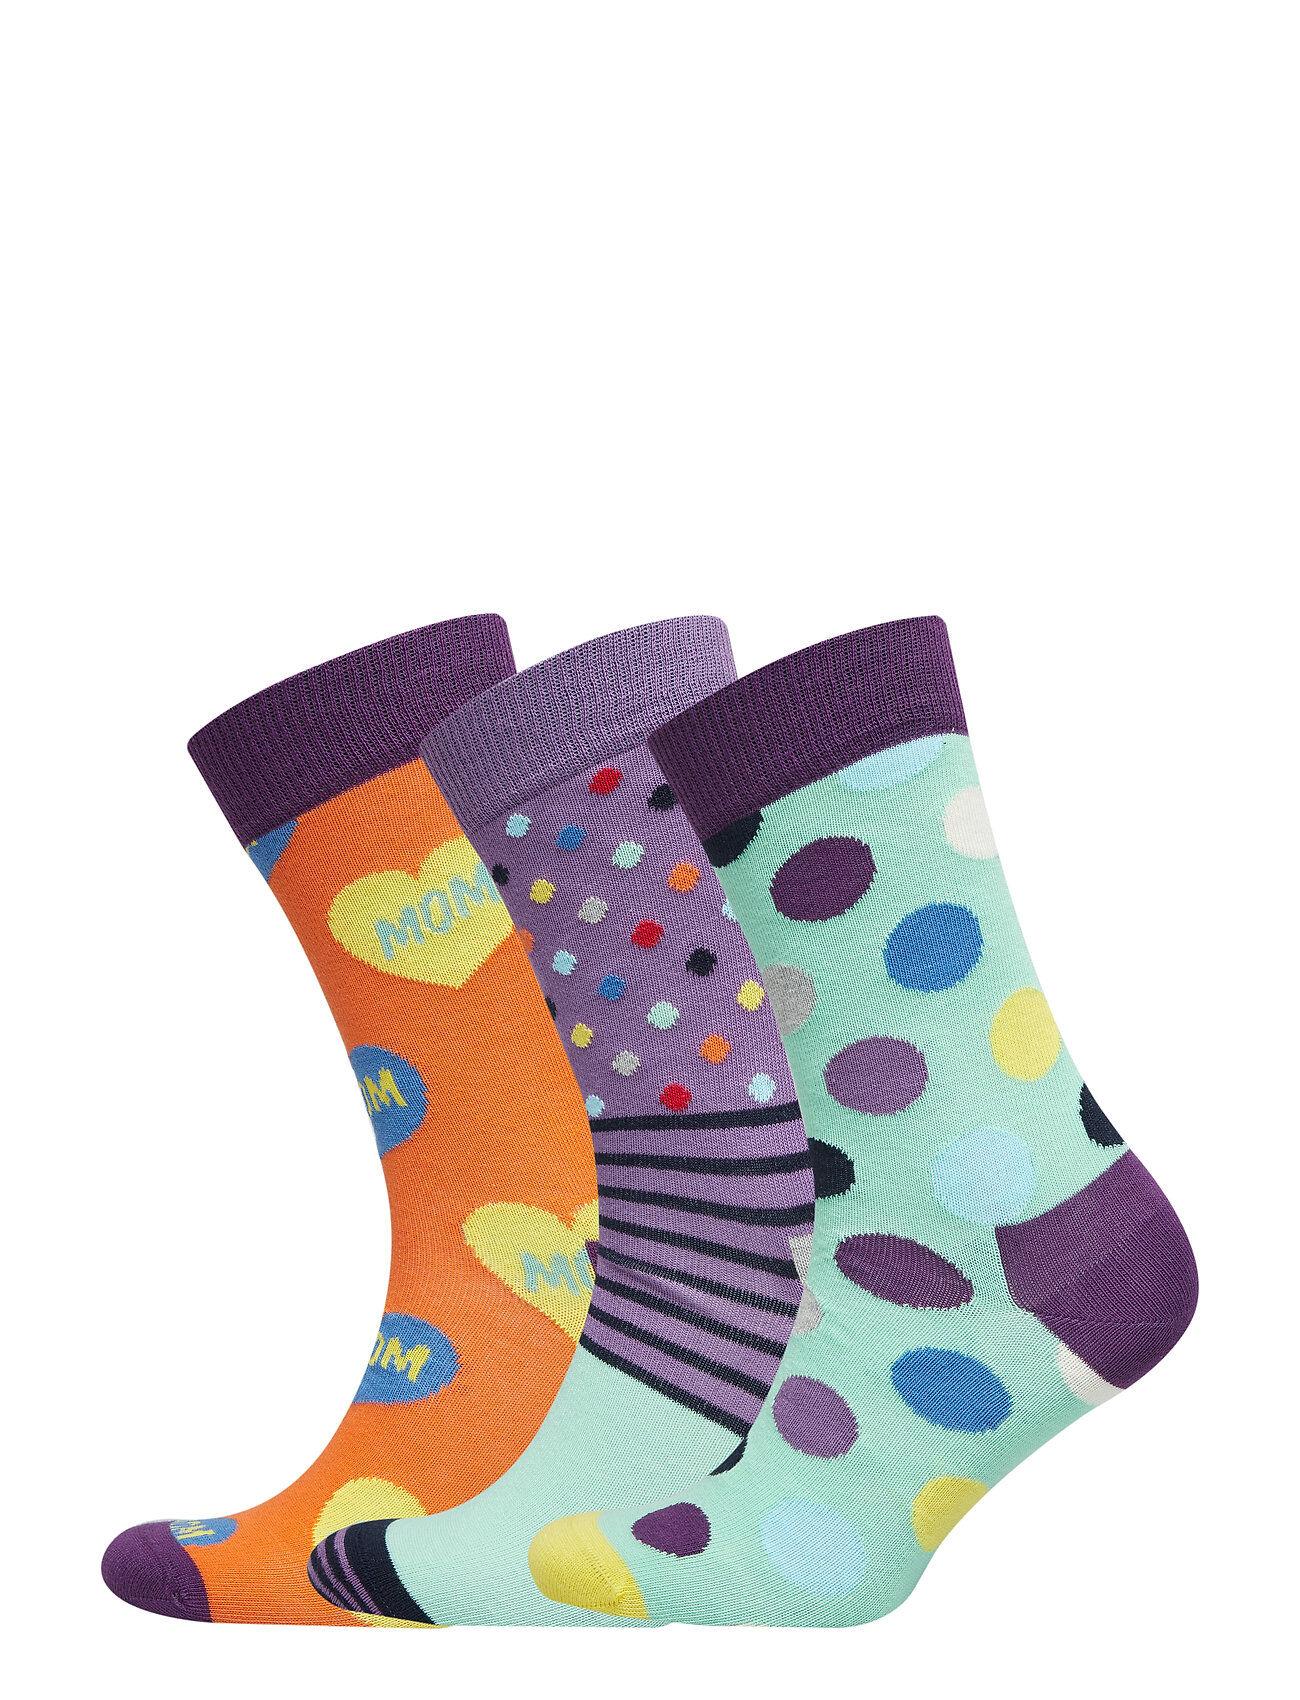 Happy Socks Mother